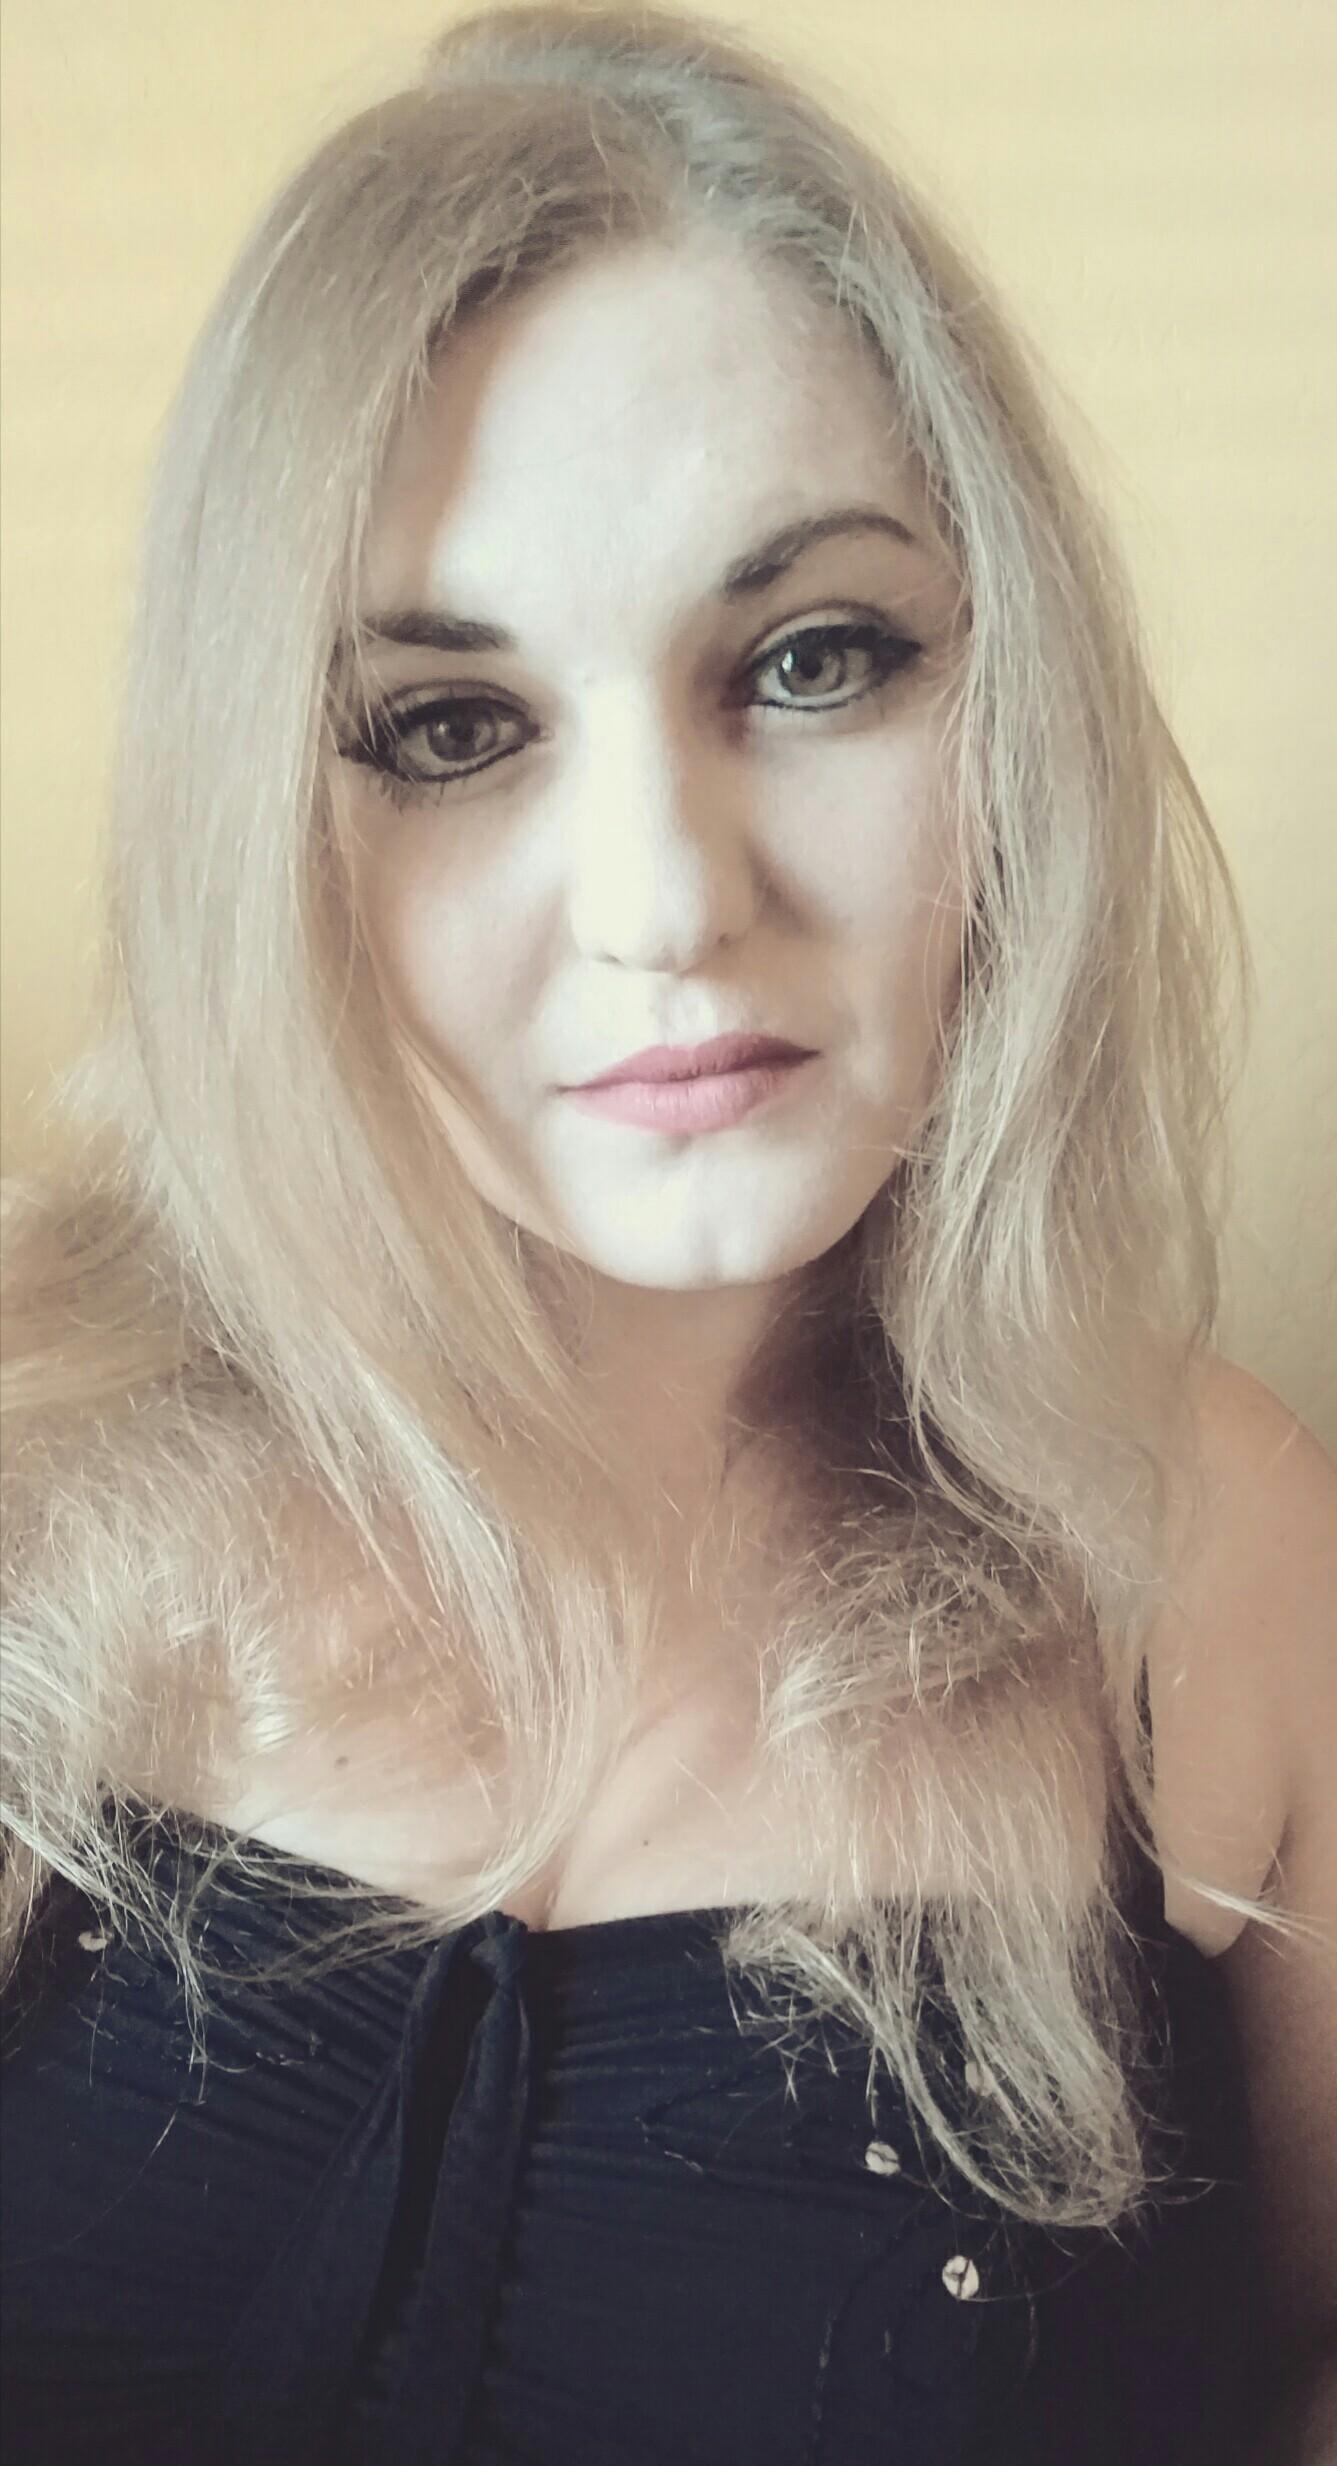 Michala S.